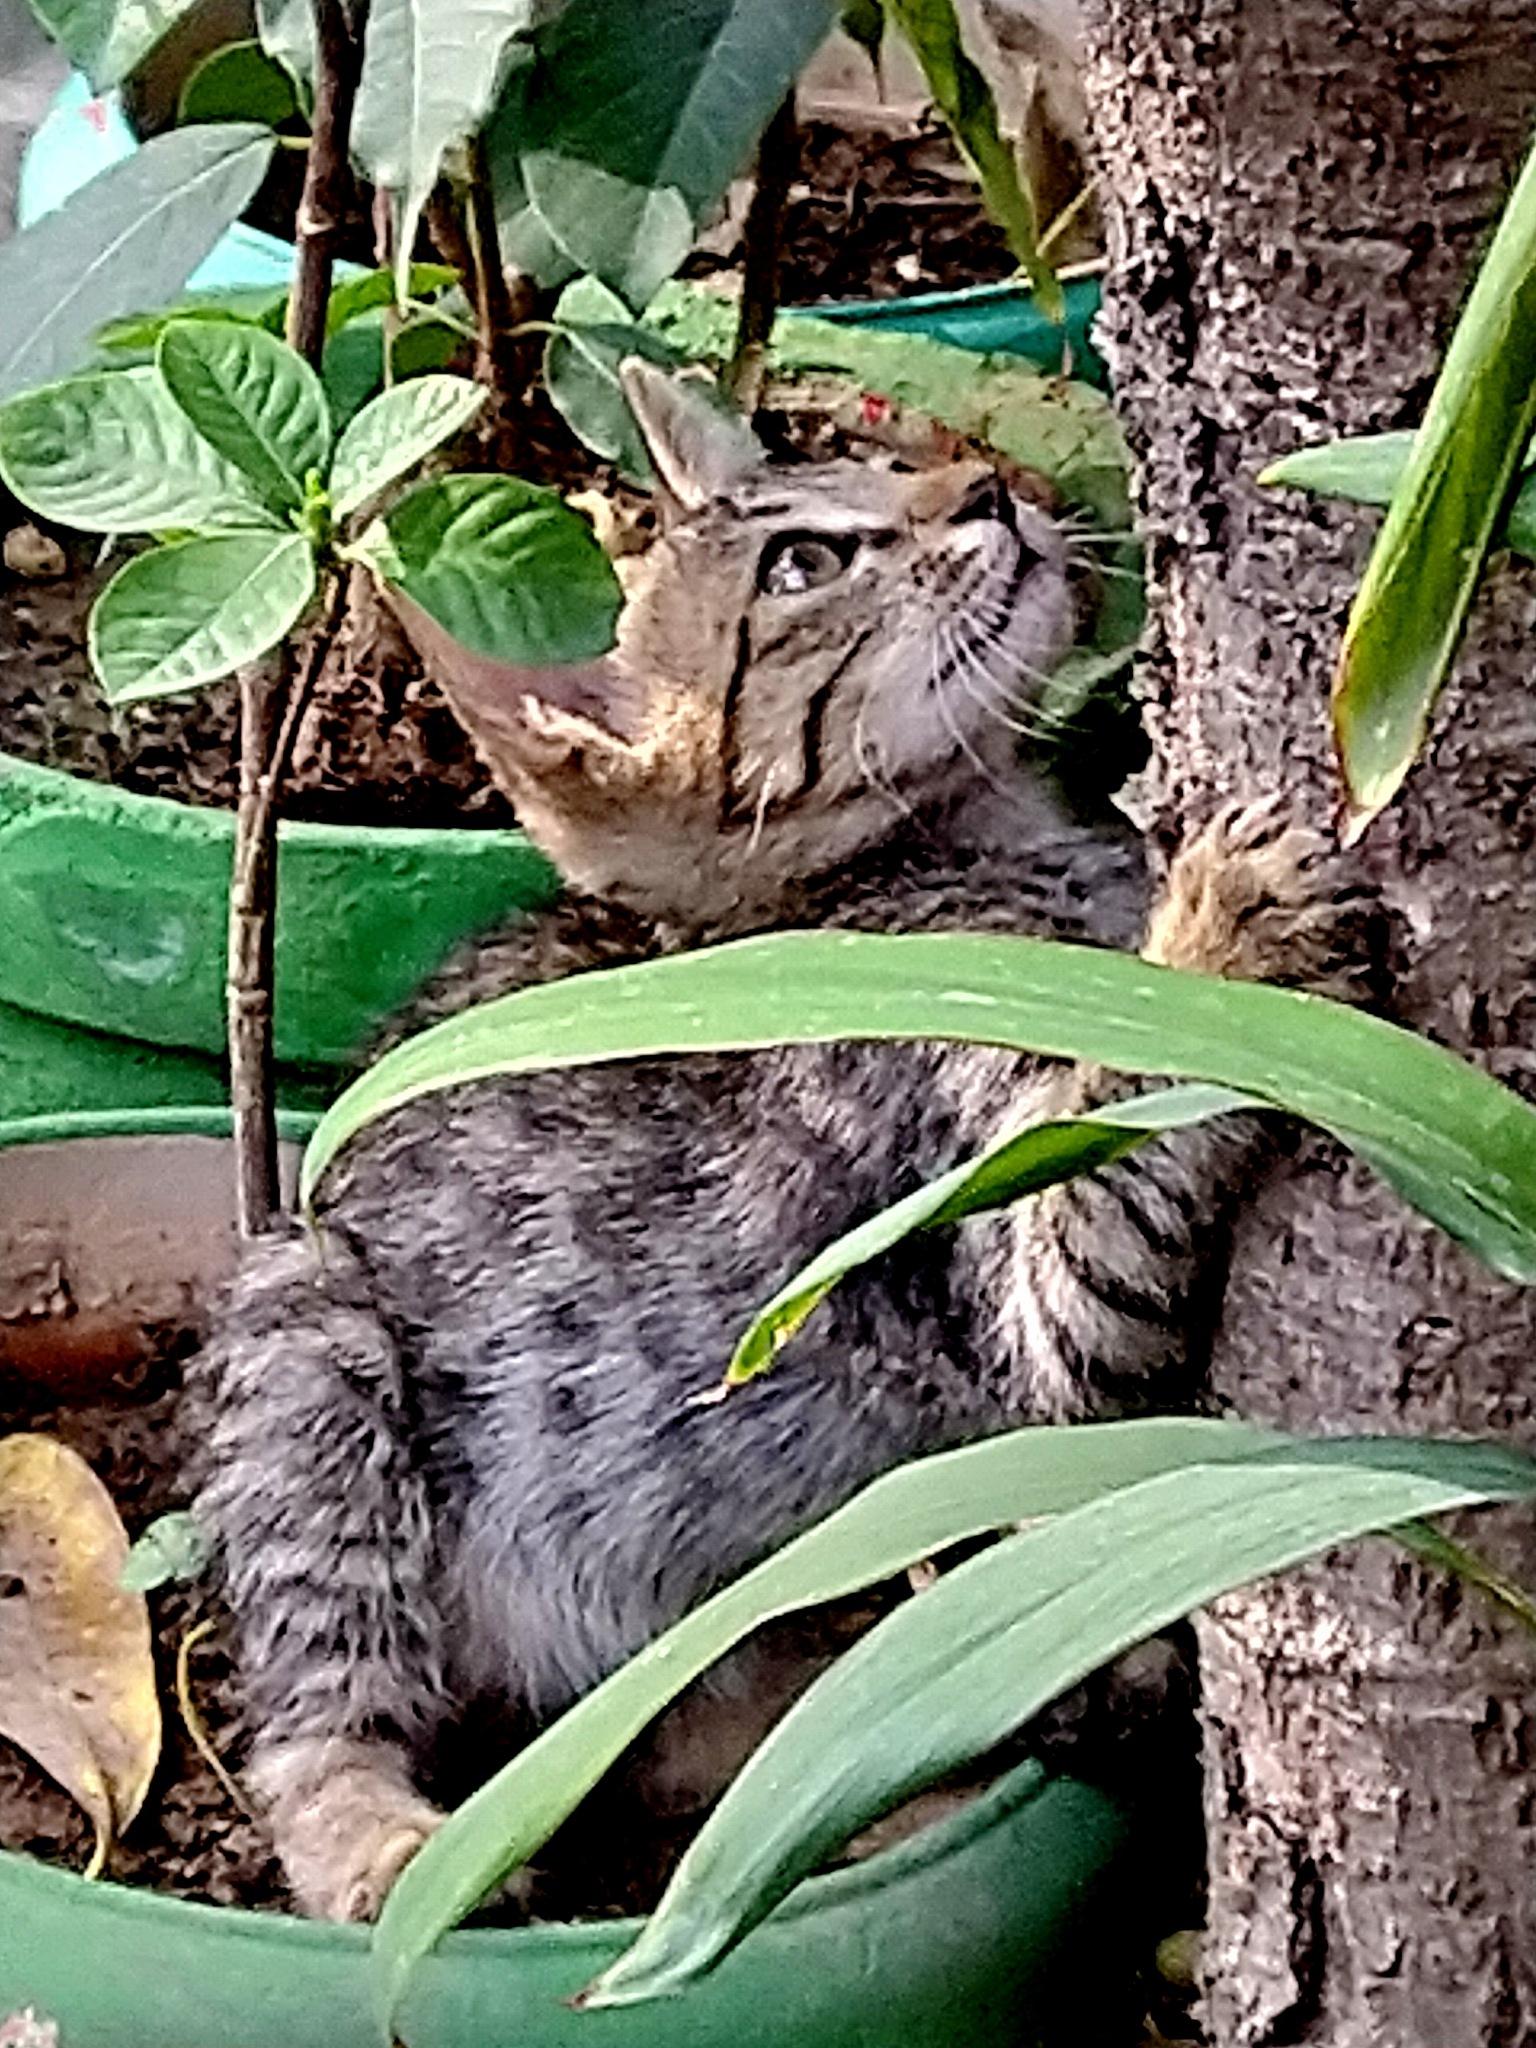 Encounter with Kittens by Suresh Tewari